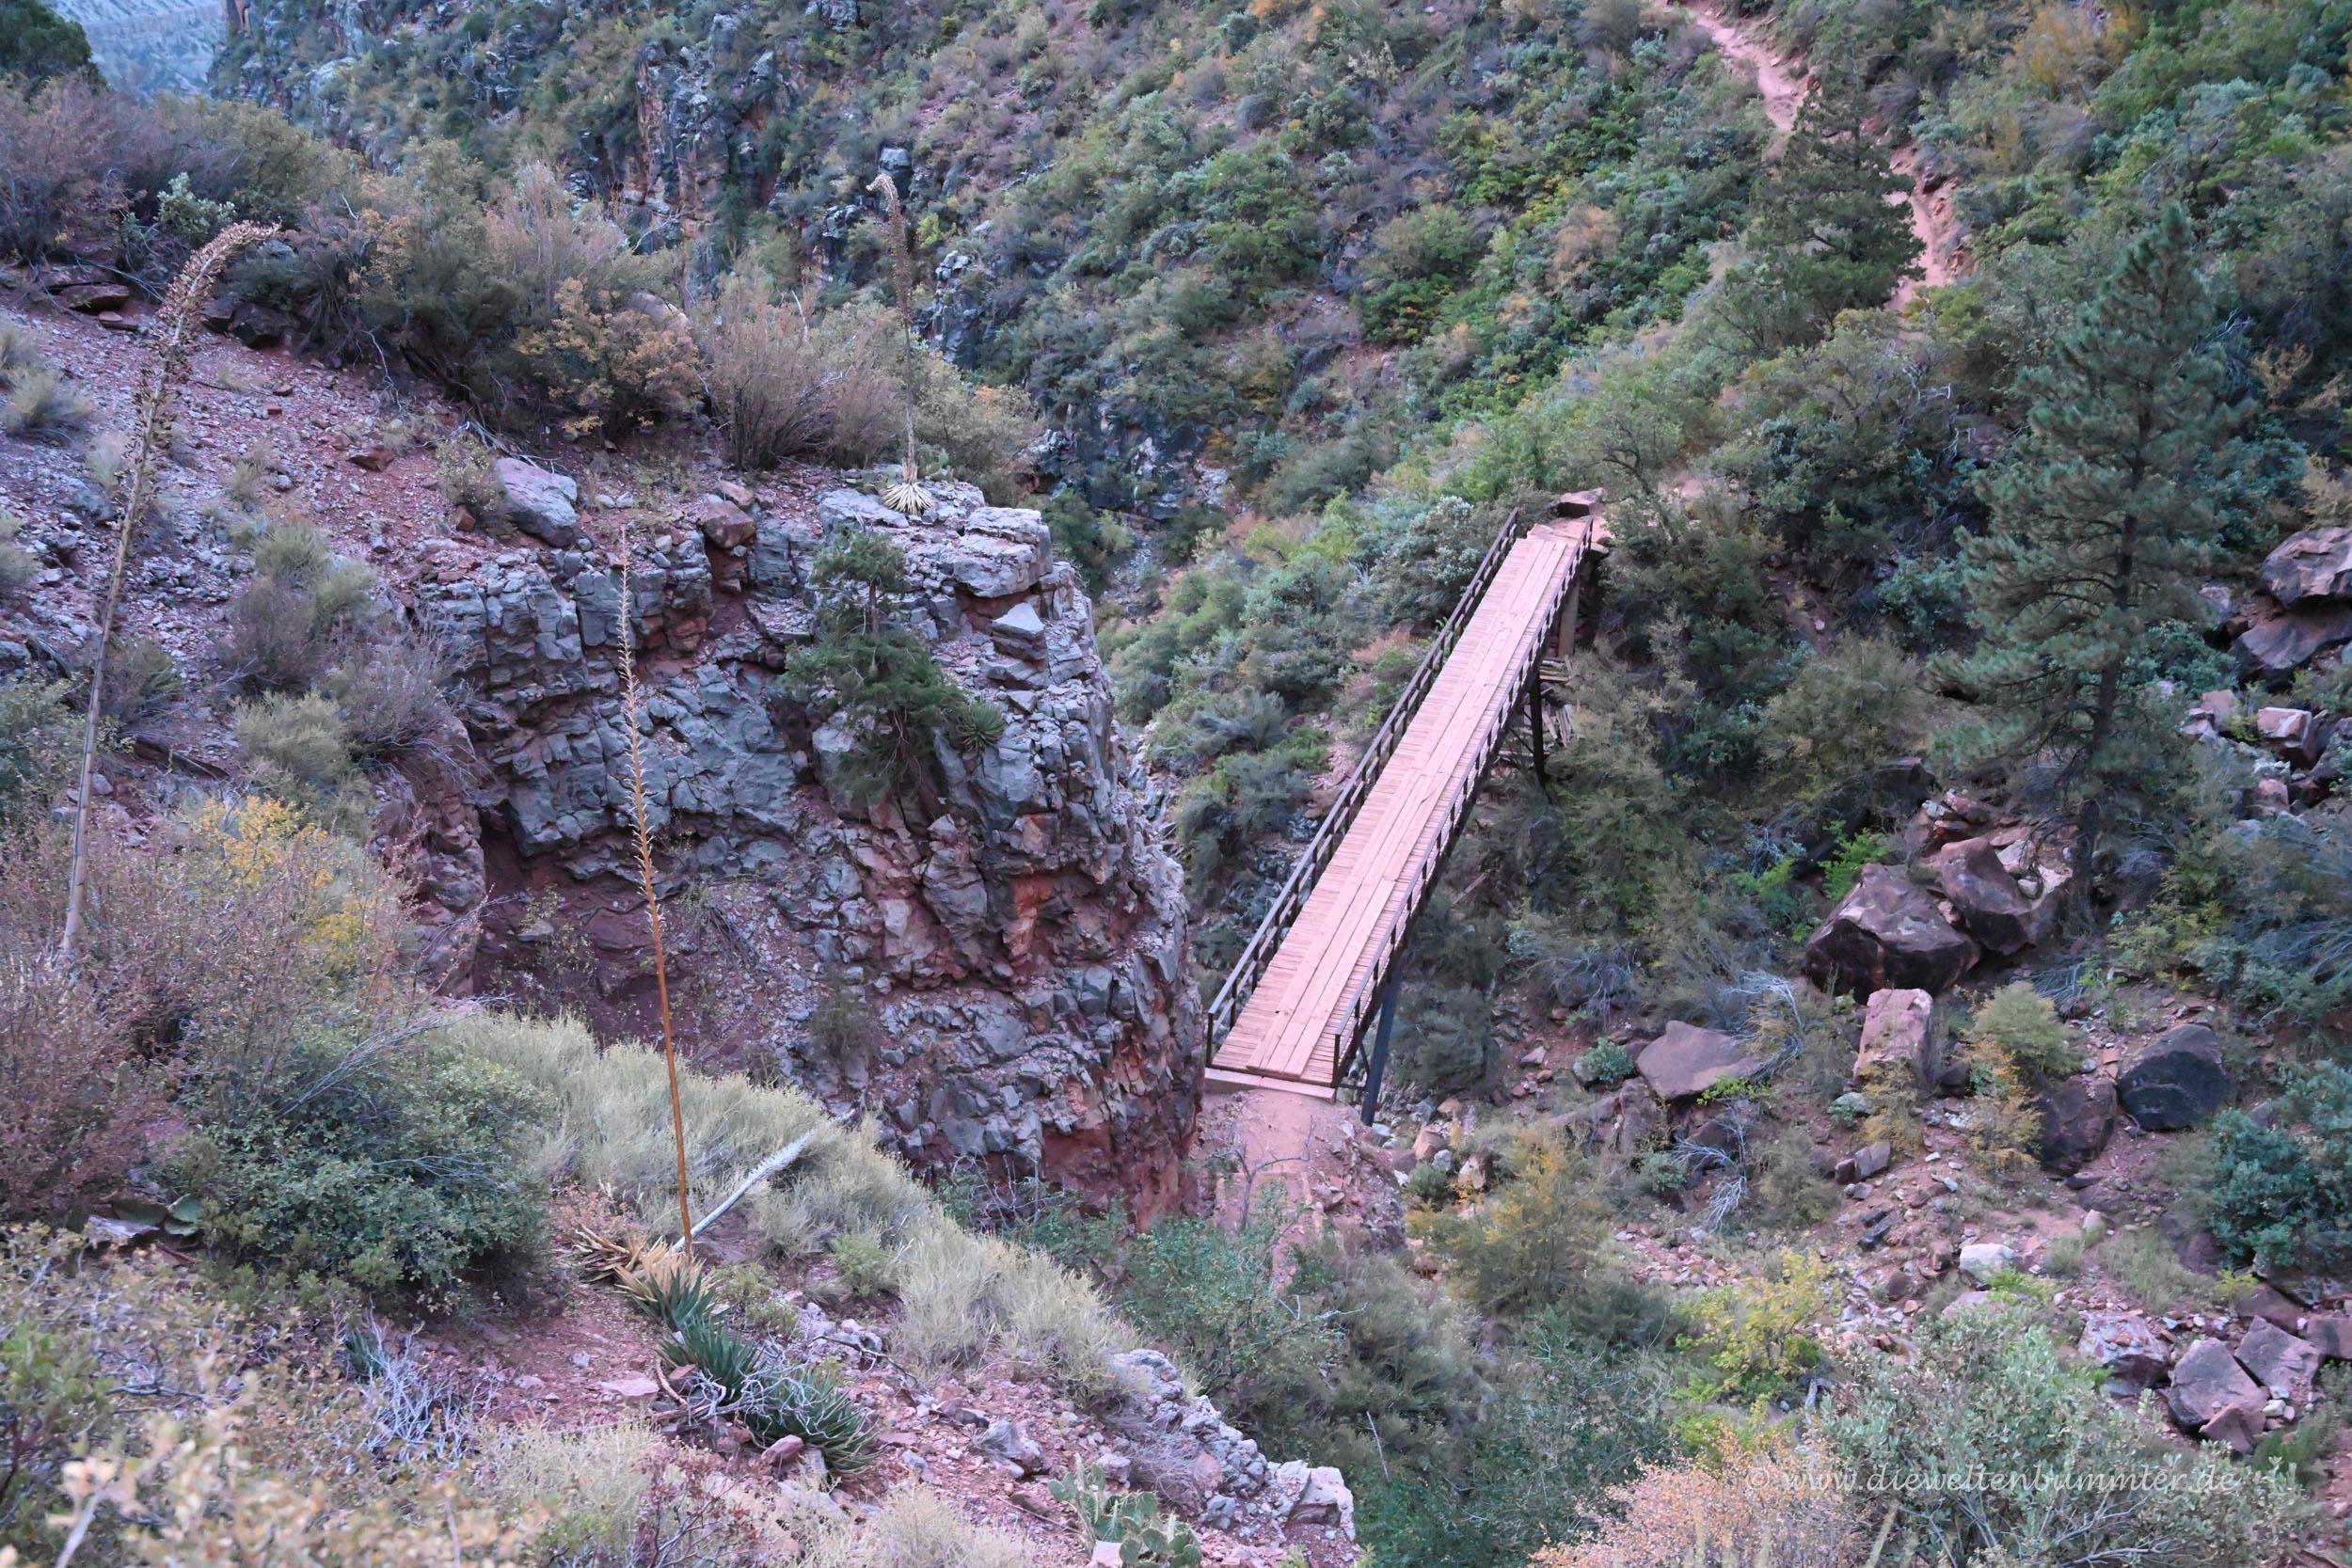 Brücke im Nebencanyon